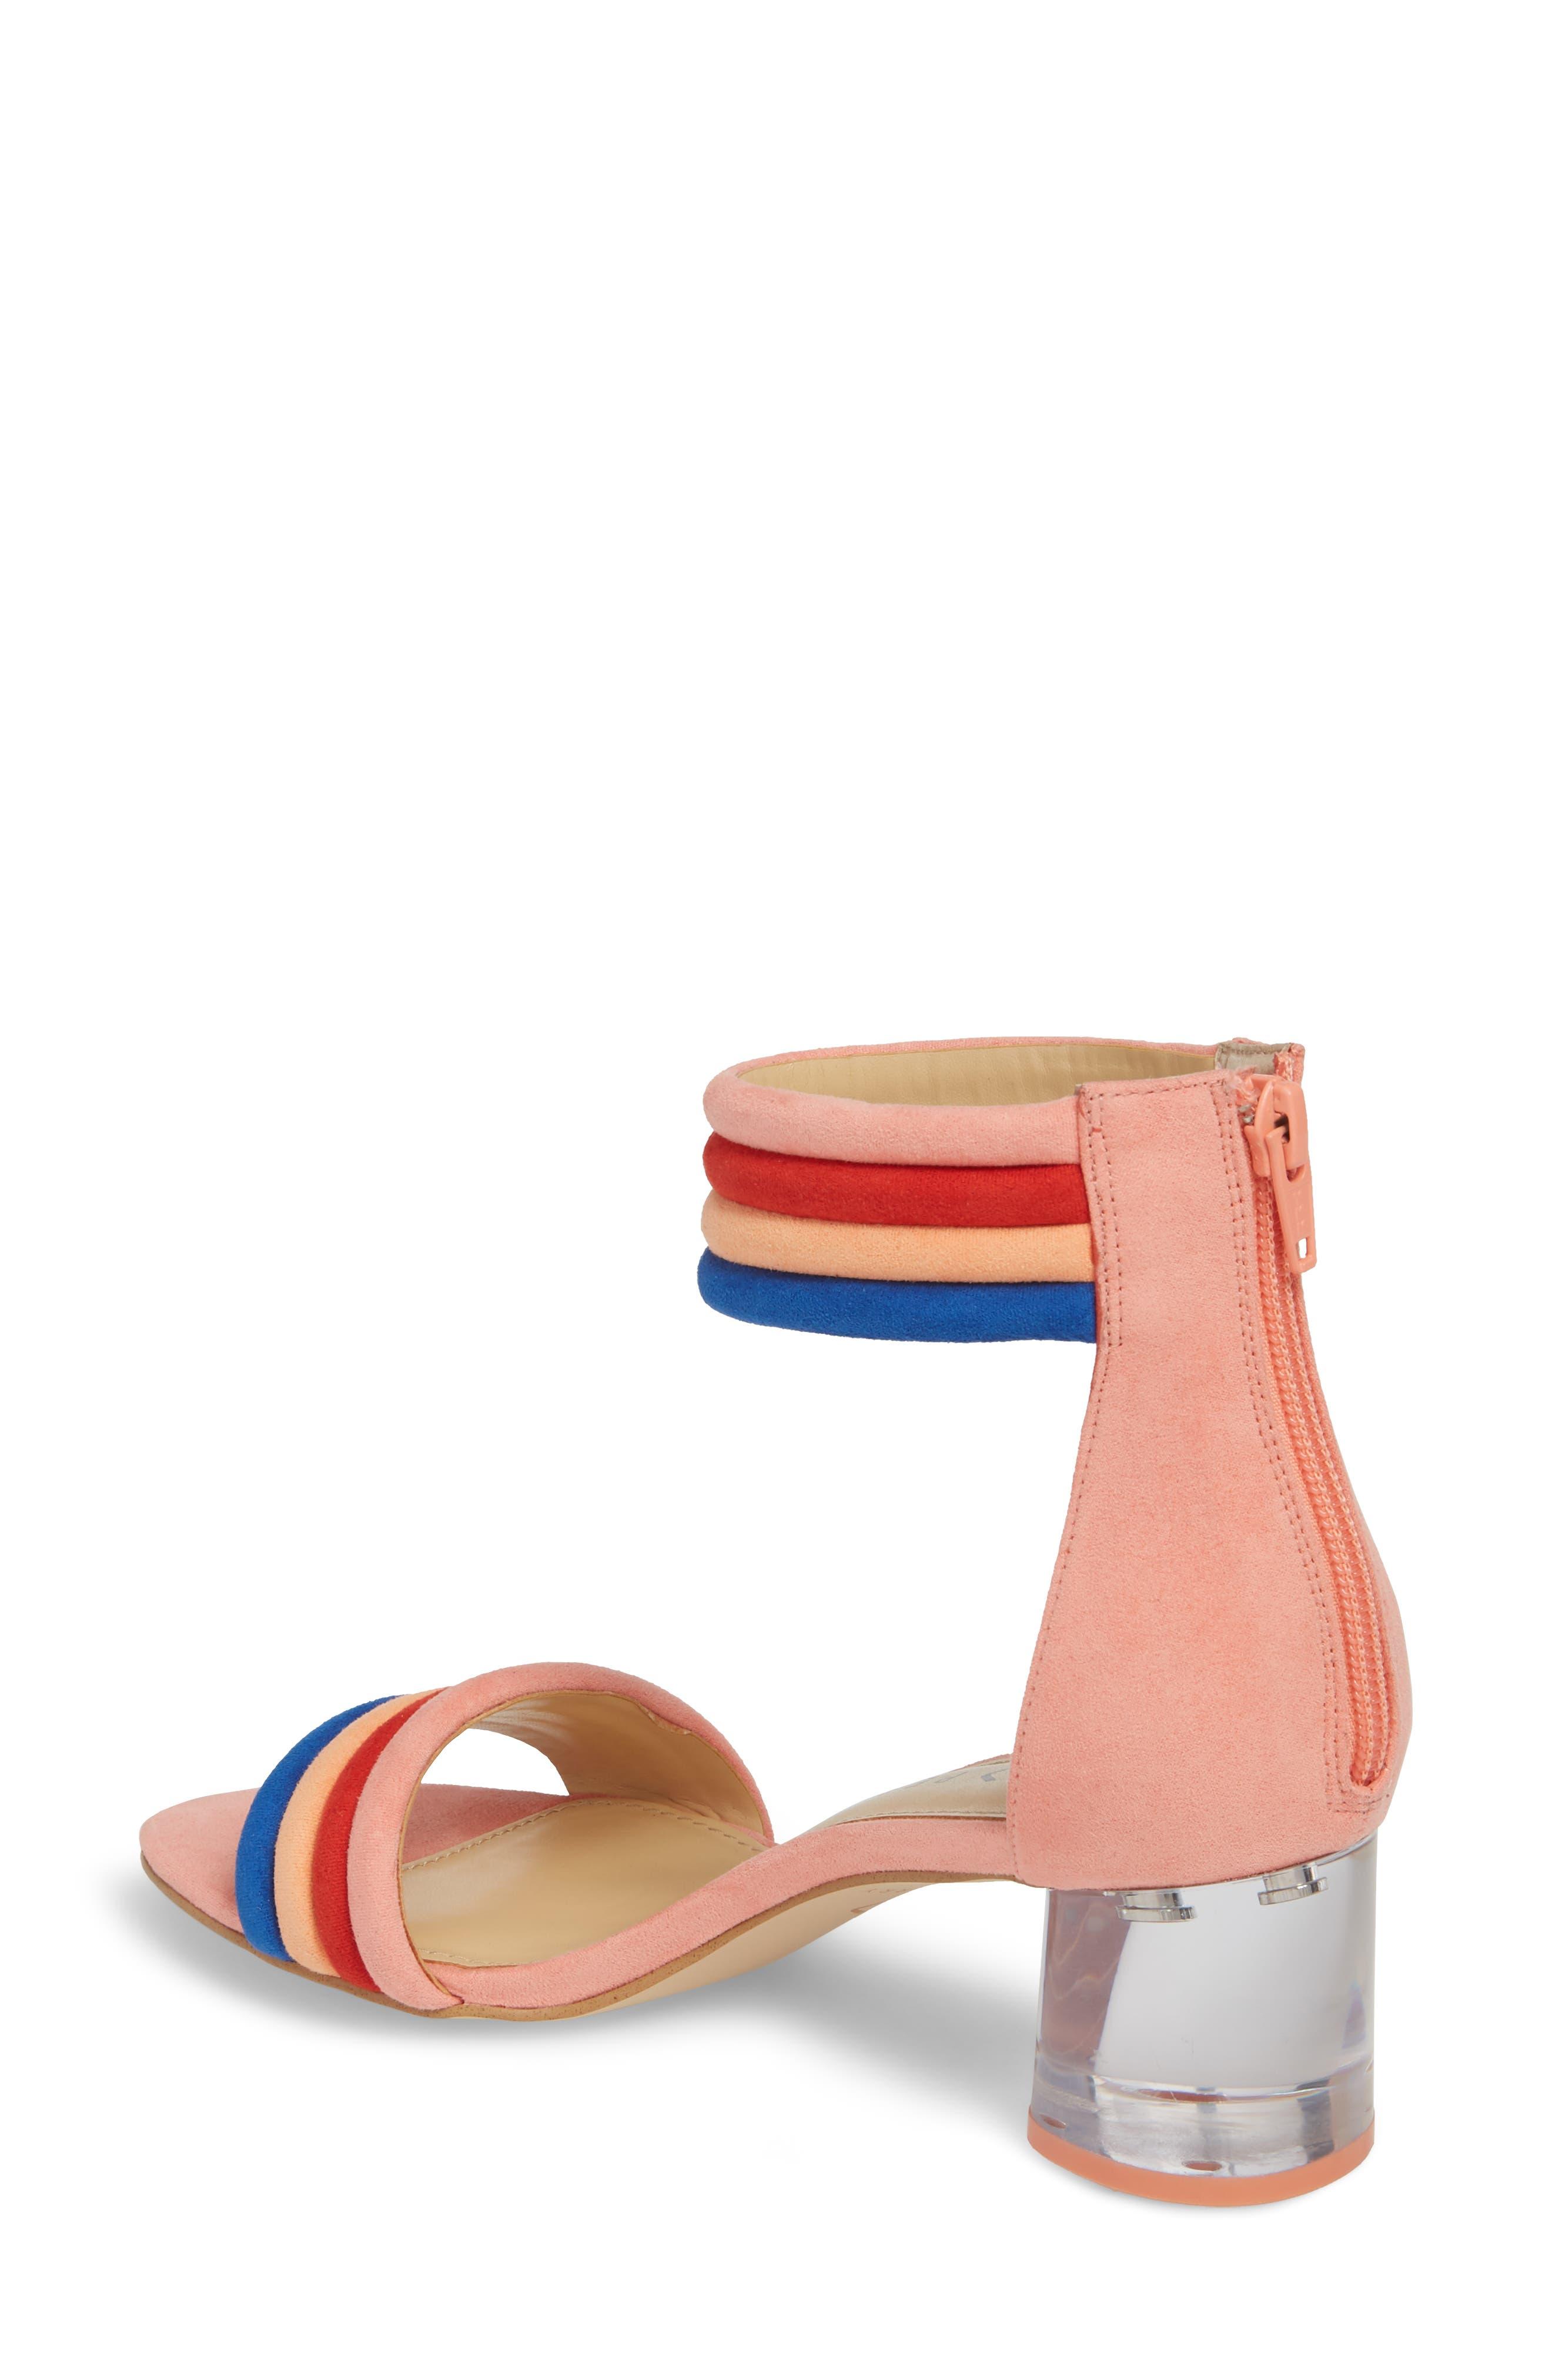 Tube Strap Sandal,                             Alternate thumbnail 2, color,                             Pop Pink Suede